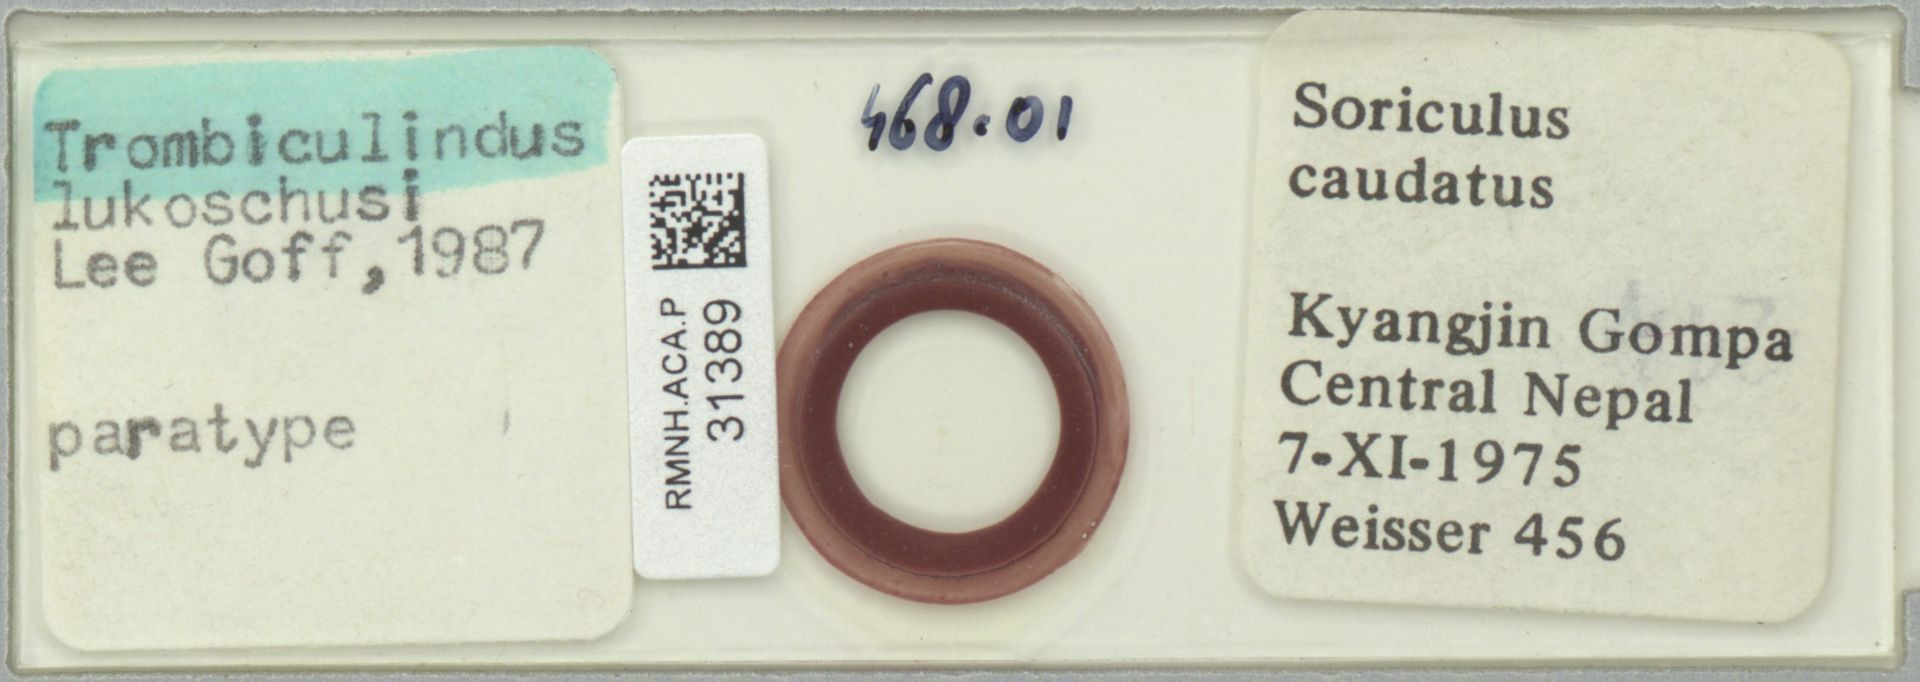 RMNH.ACA.P.31389 | Trombiculindus lukoschusi Lee Goff, 1987